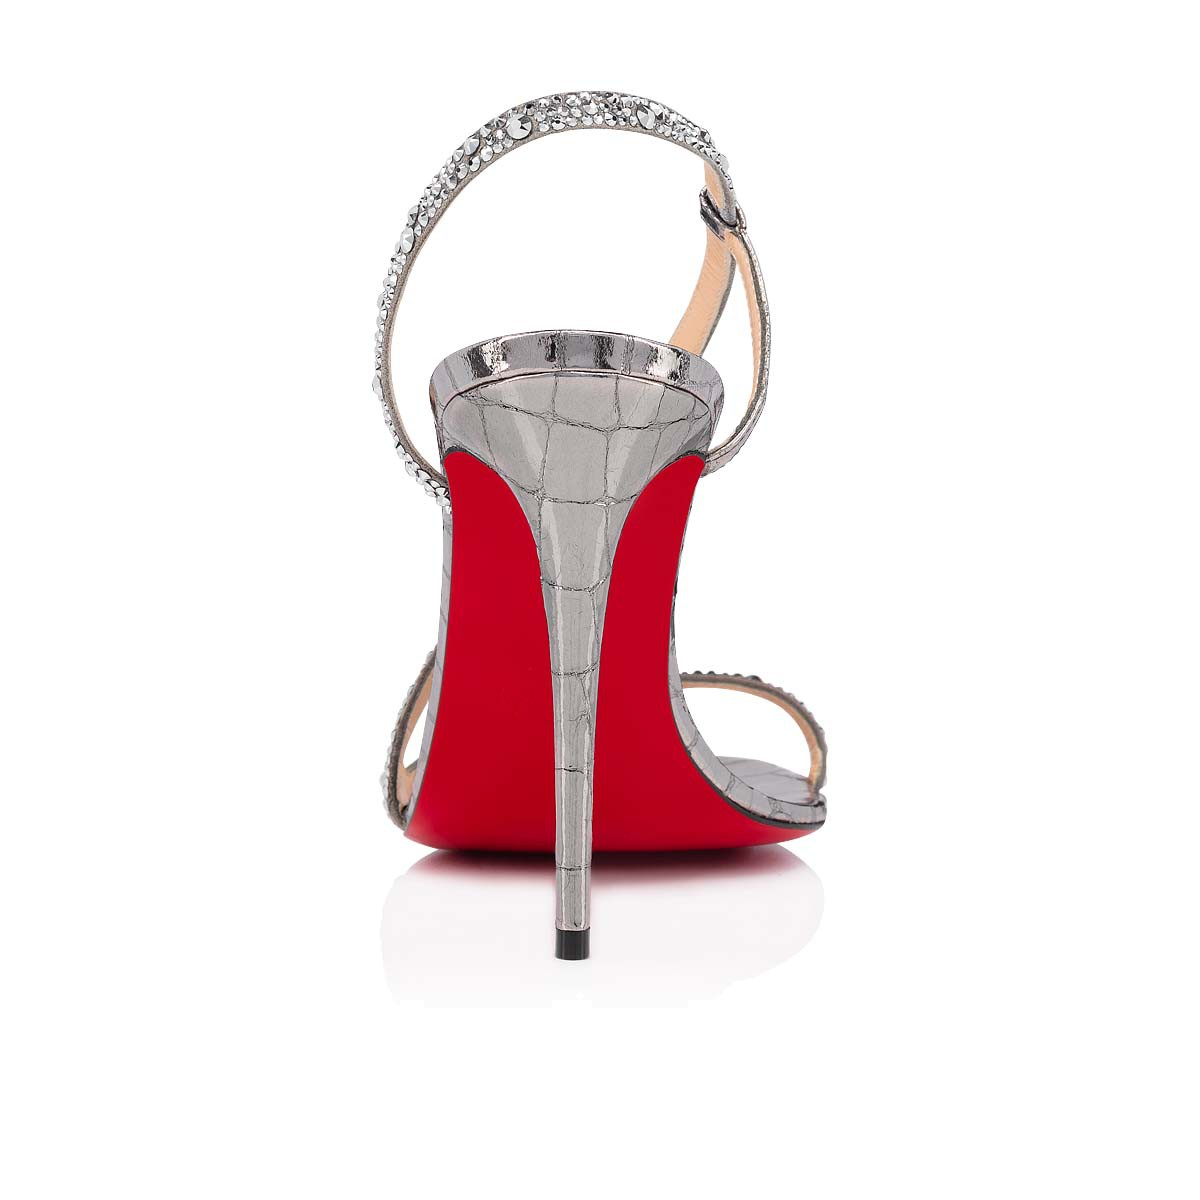 鞋履 - Rosalie Strass - Christian Louboutin